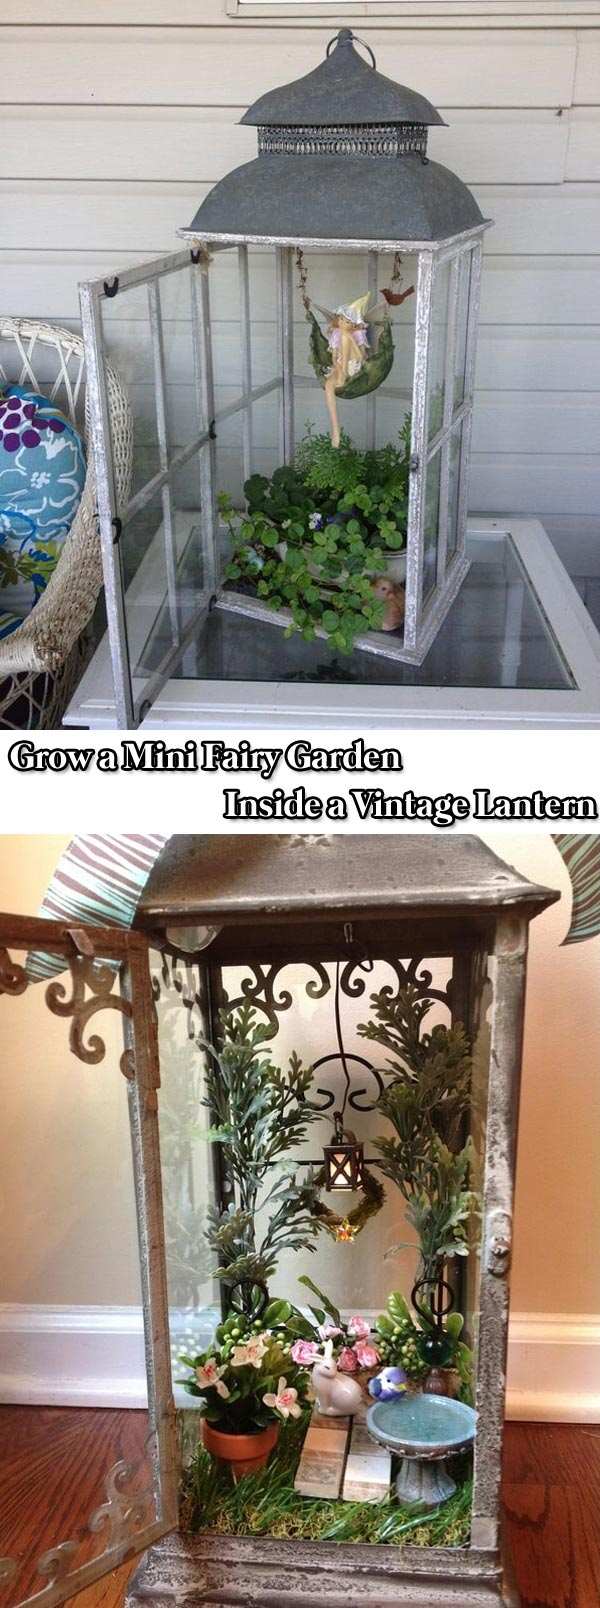 Grow a Mini Fairy Garden Inside a Vintage Lantern